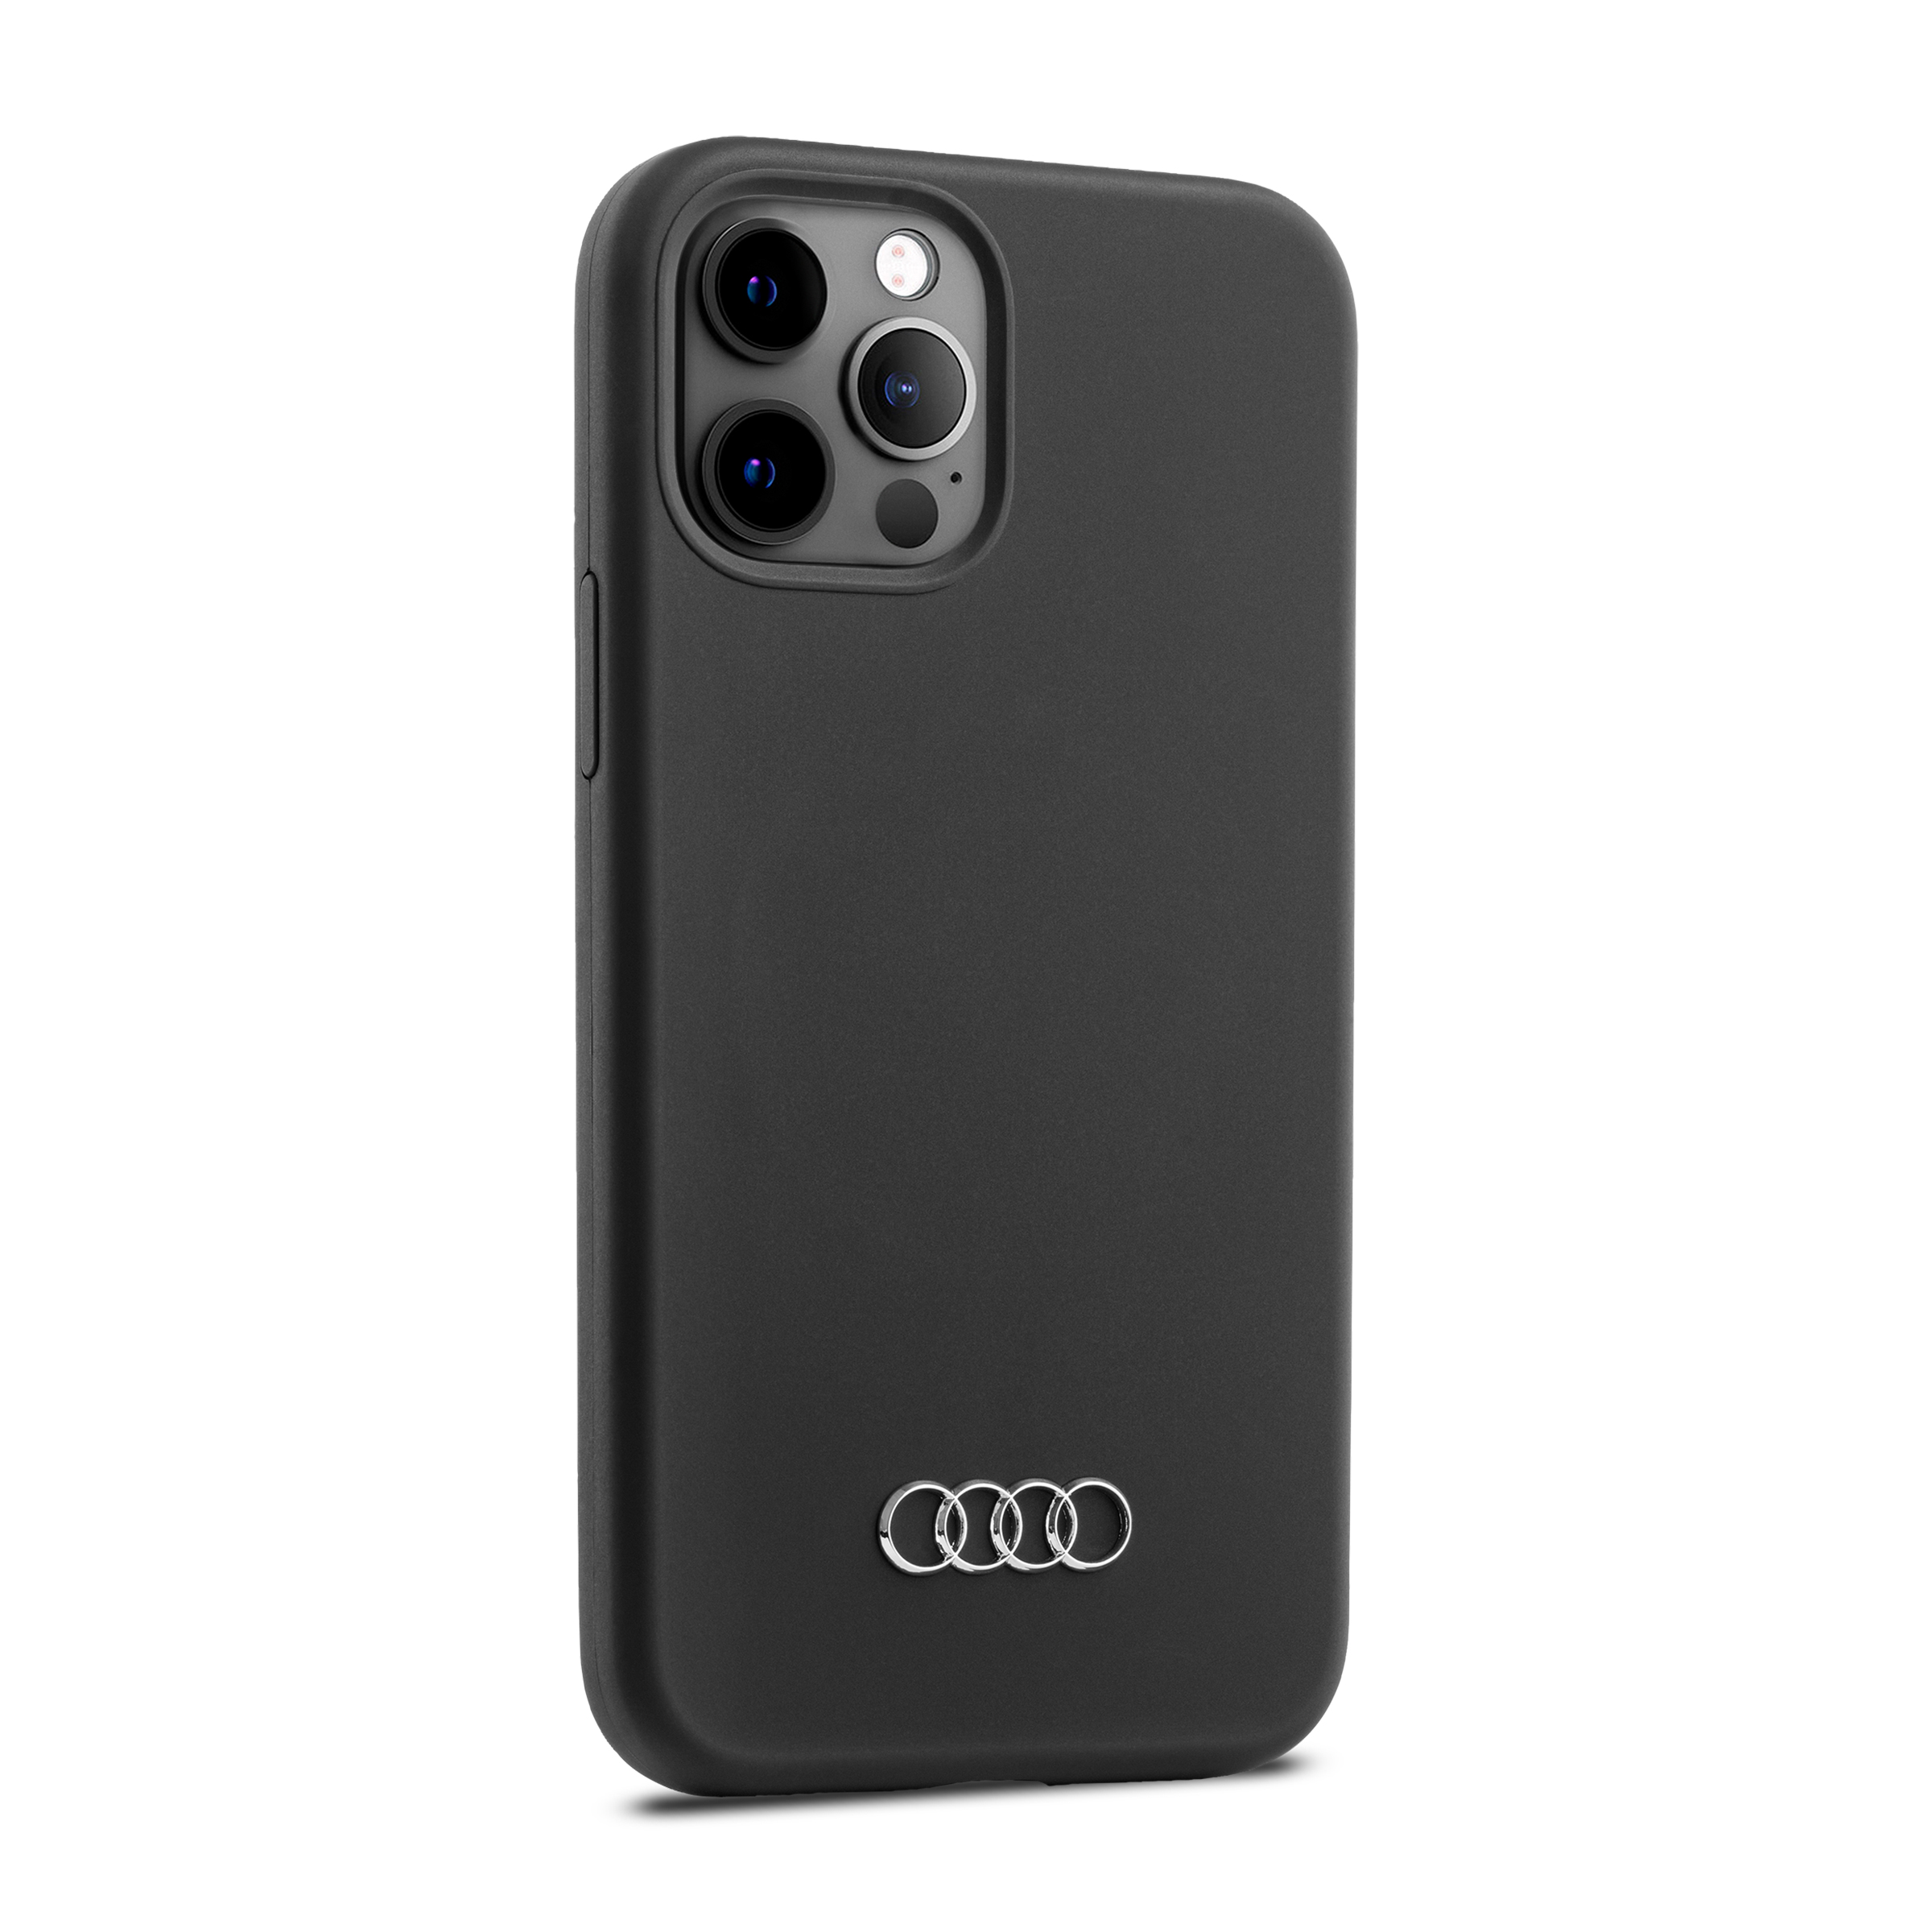 Audi Smartphonecase, iPhone12/12Pro, schwarz